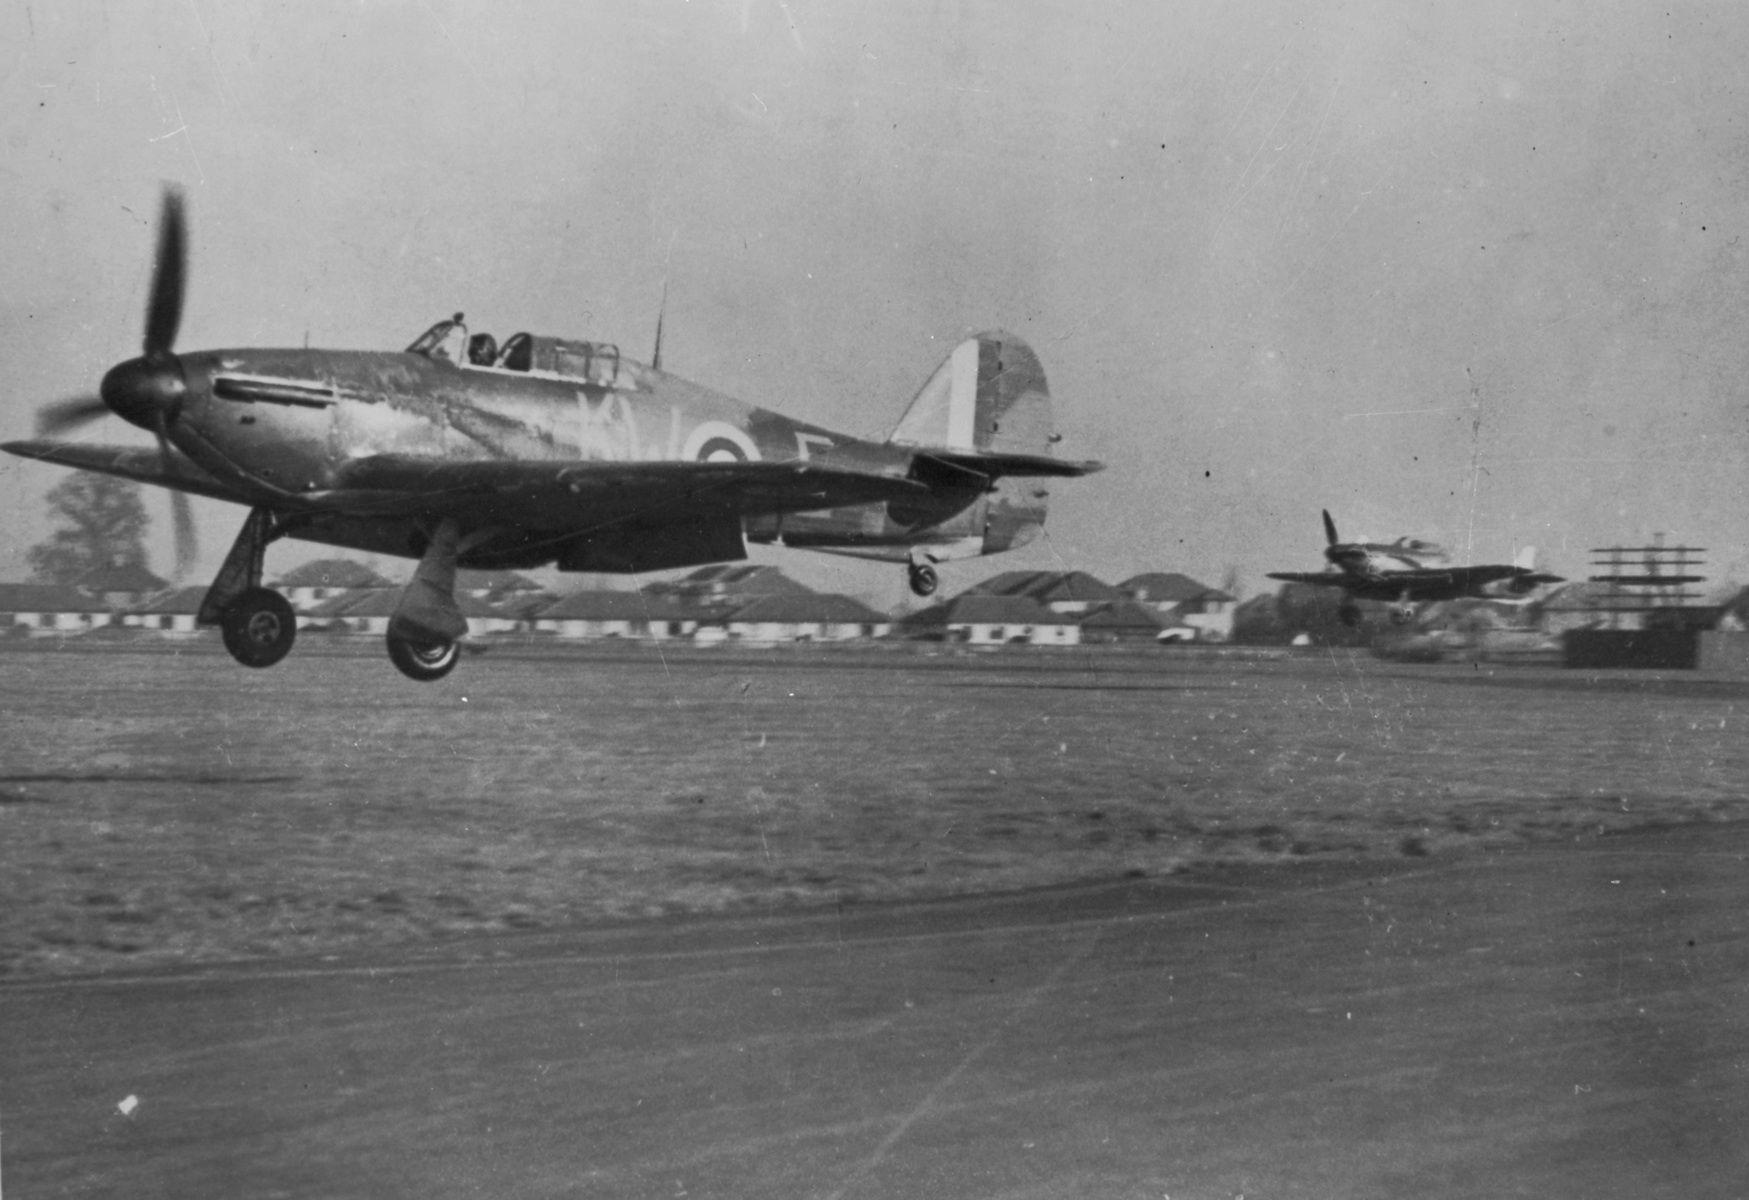 Hawker Hurricane Mk.I, KW-E, No. 615 Squadron RAF, 1940